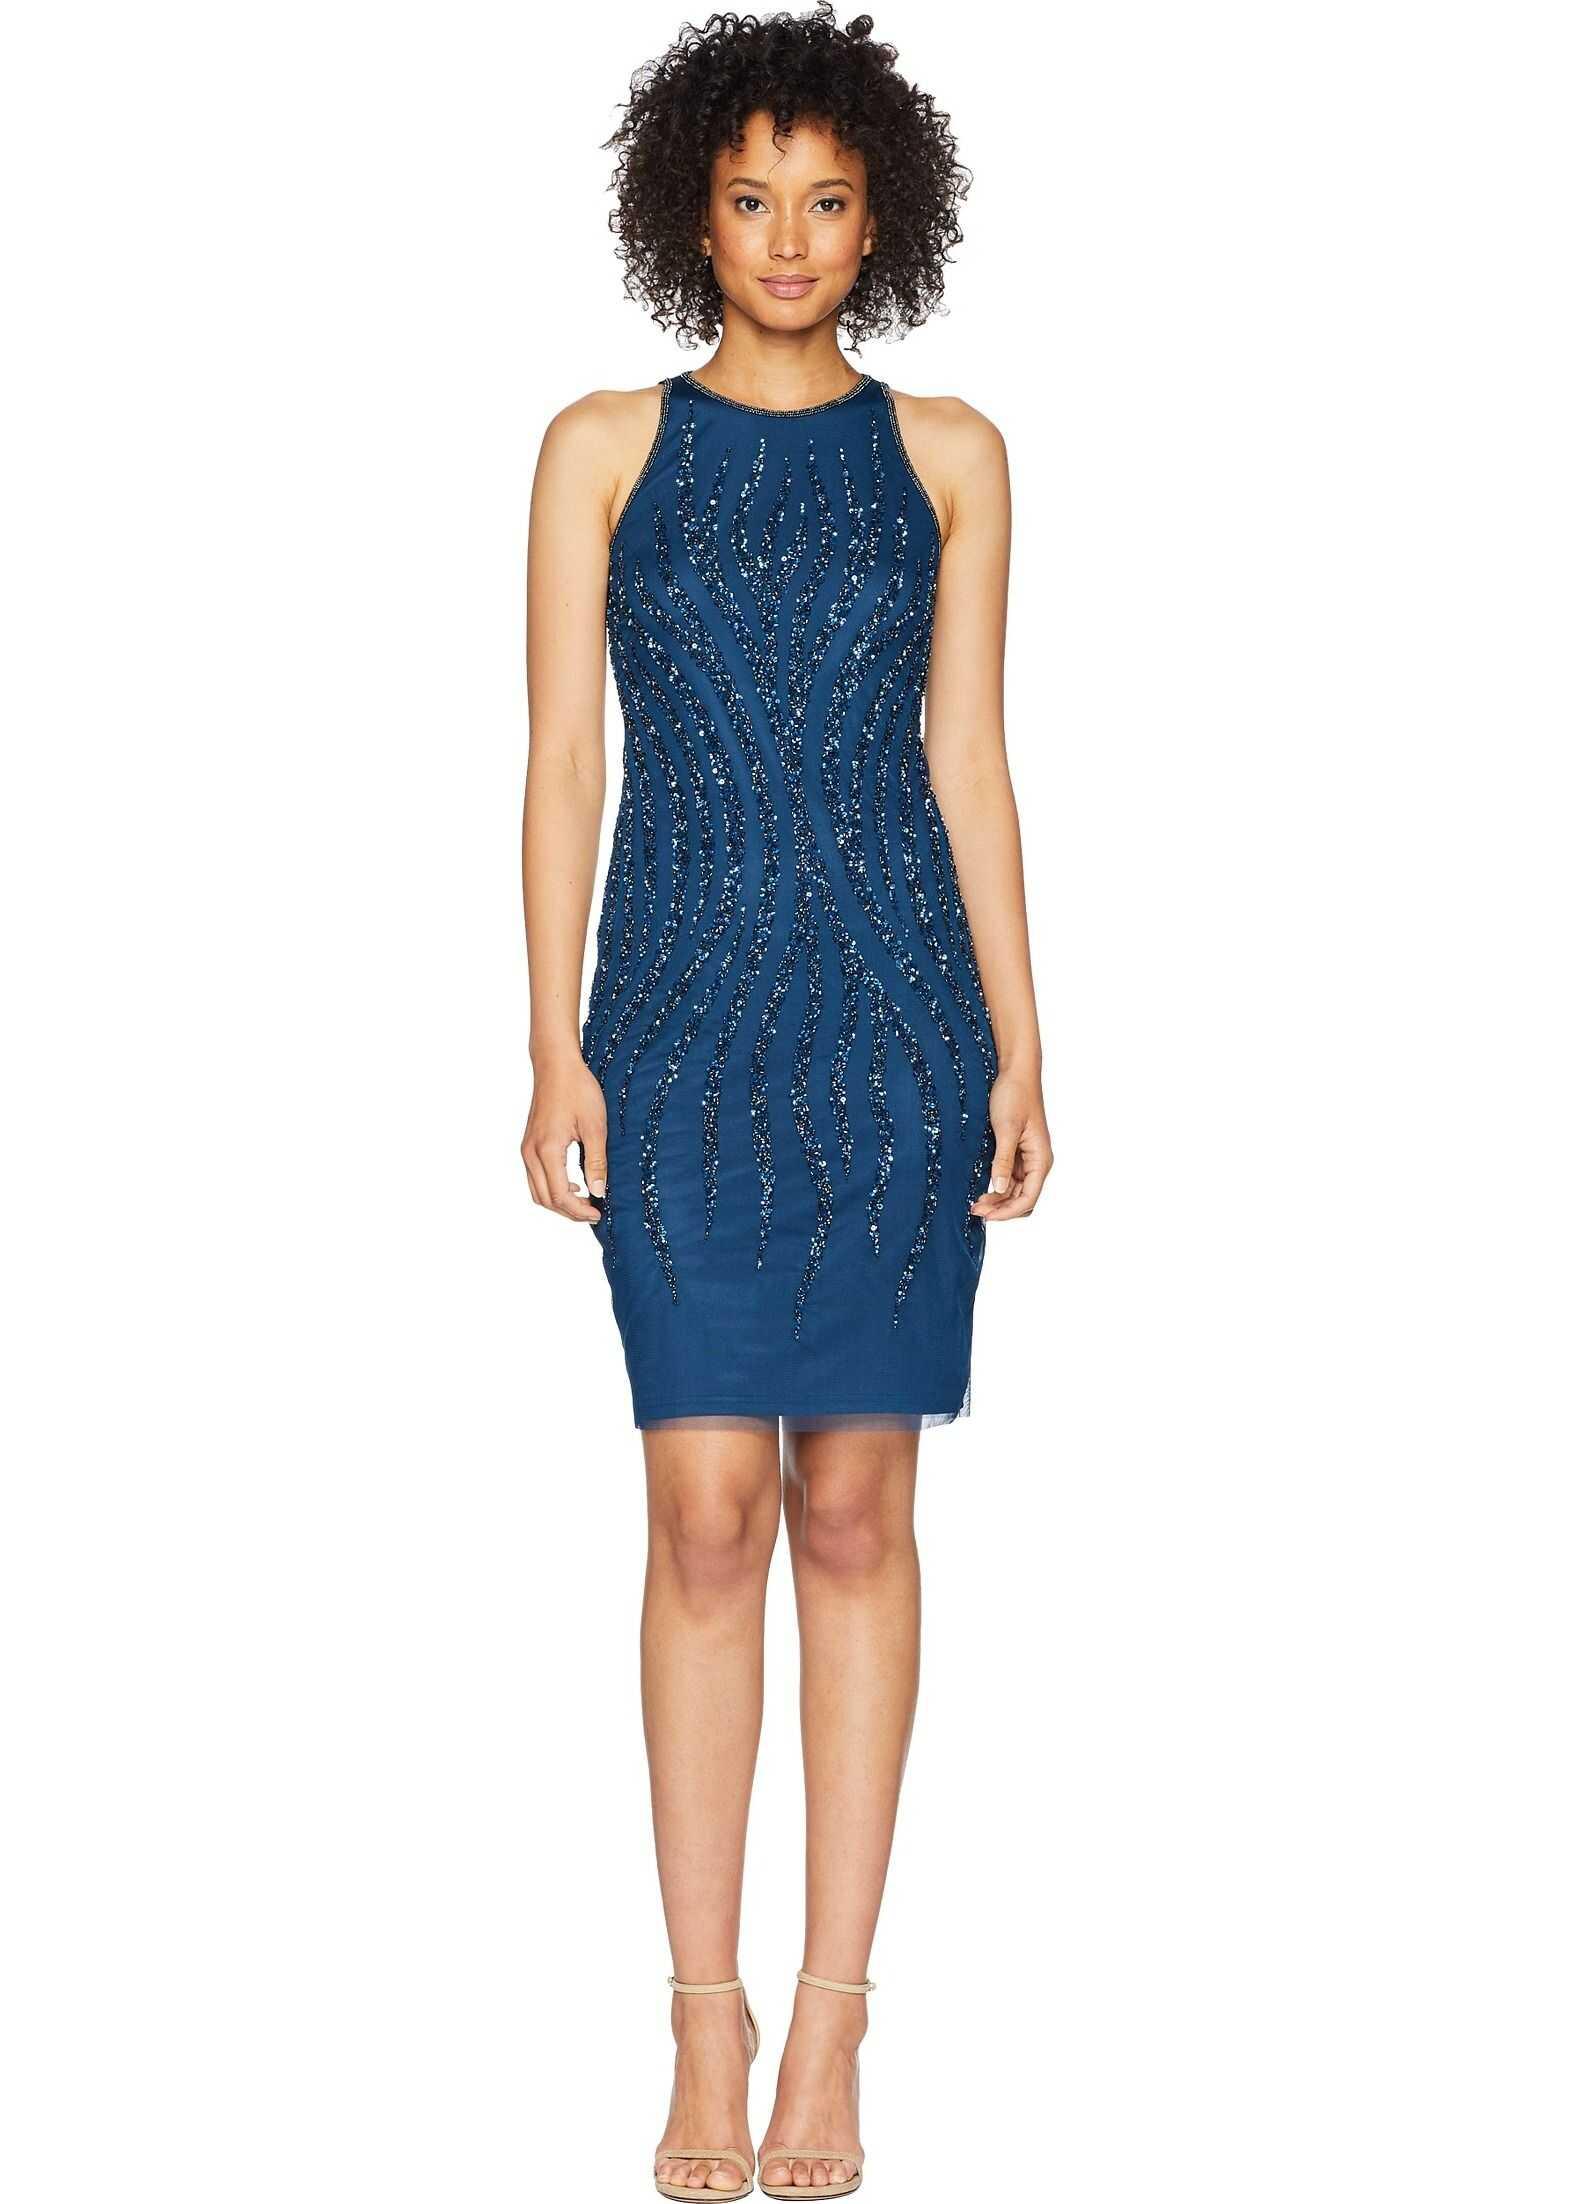 Adrianna Papell Beaded Halter Cocktail Dress* Deep Blue